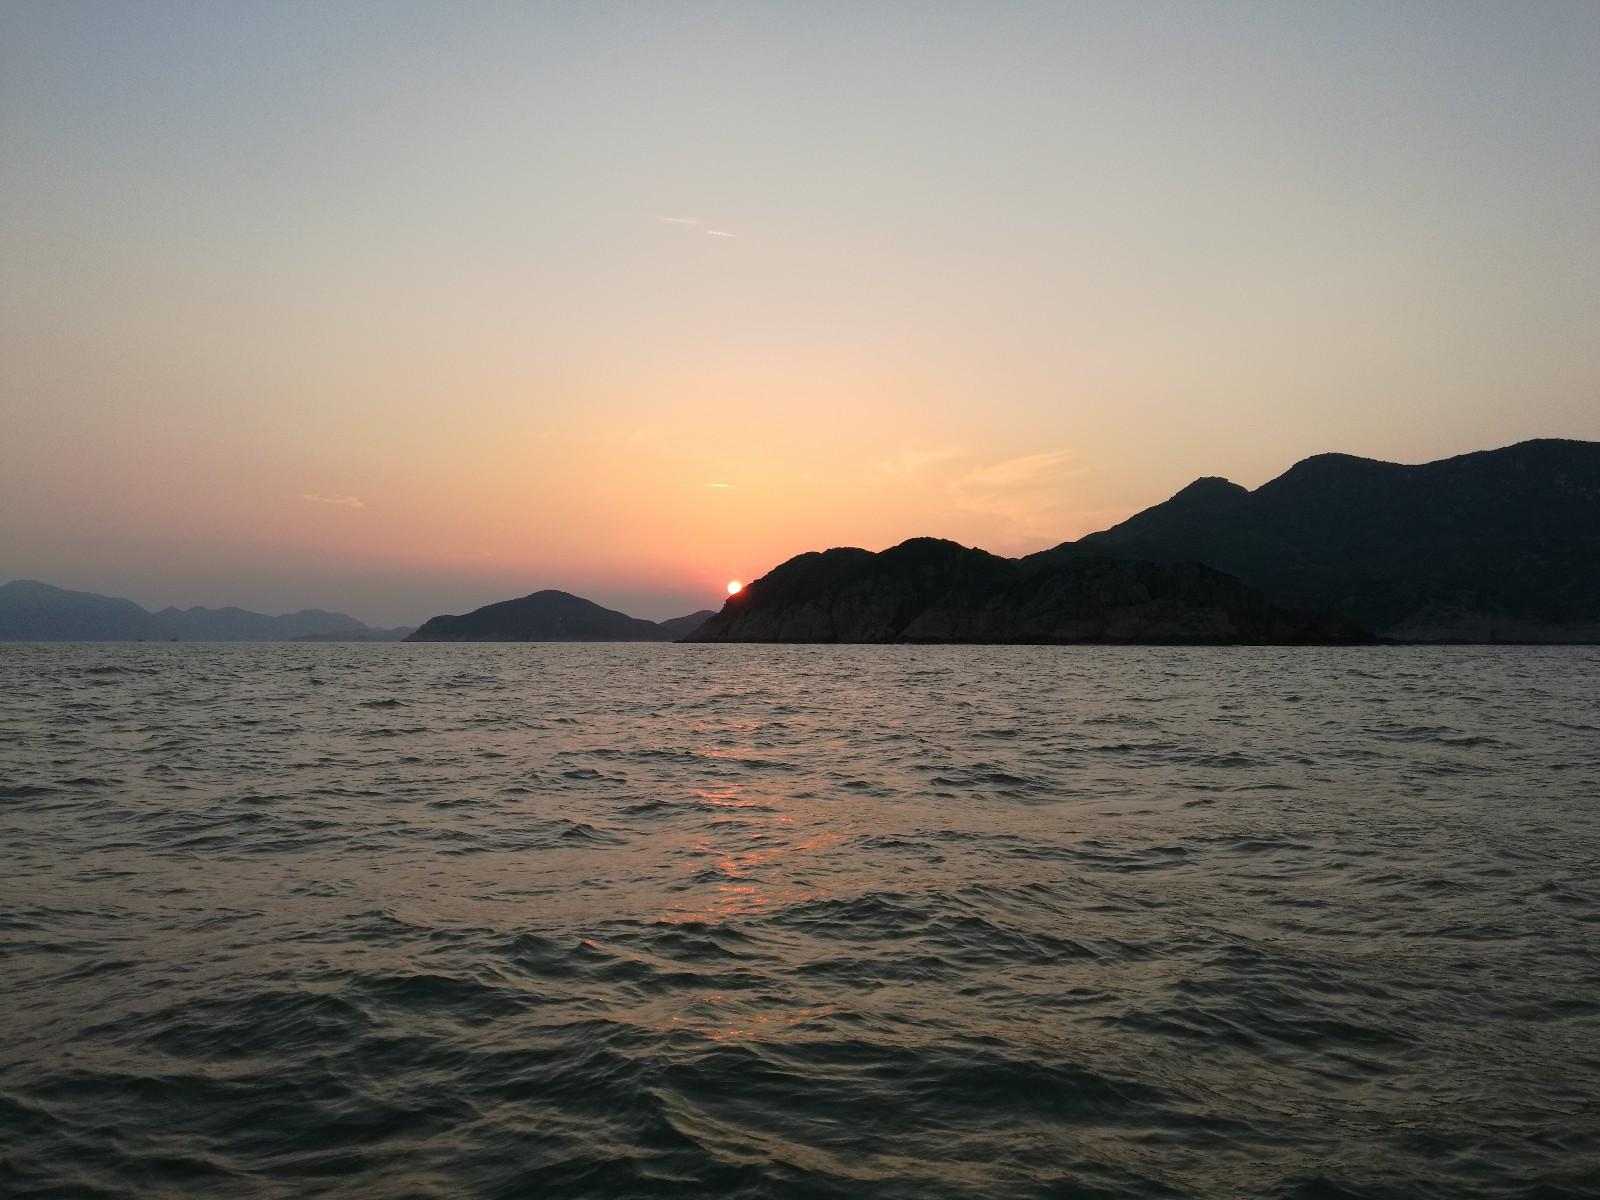 nbsp,岛屿,只能,一样,海域 真正的历练才刚刚开始,航海就是挑战自己——唐山号返航记(中篇)  163632tc5h4hcm